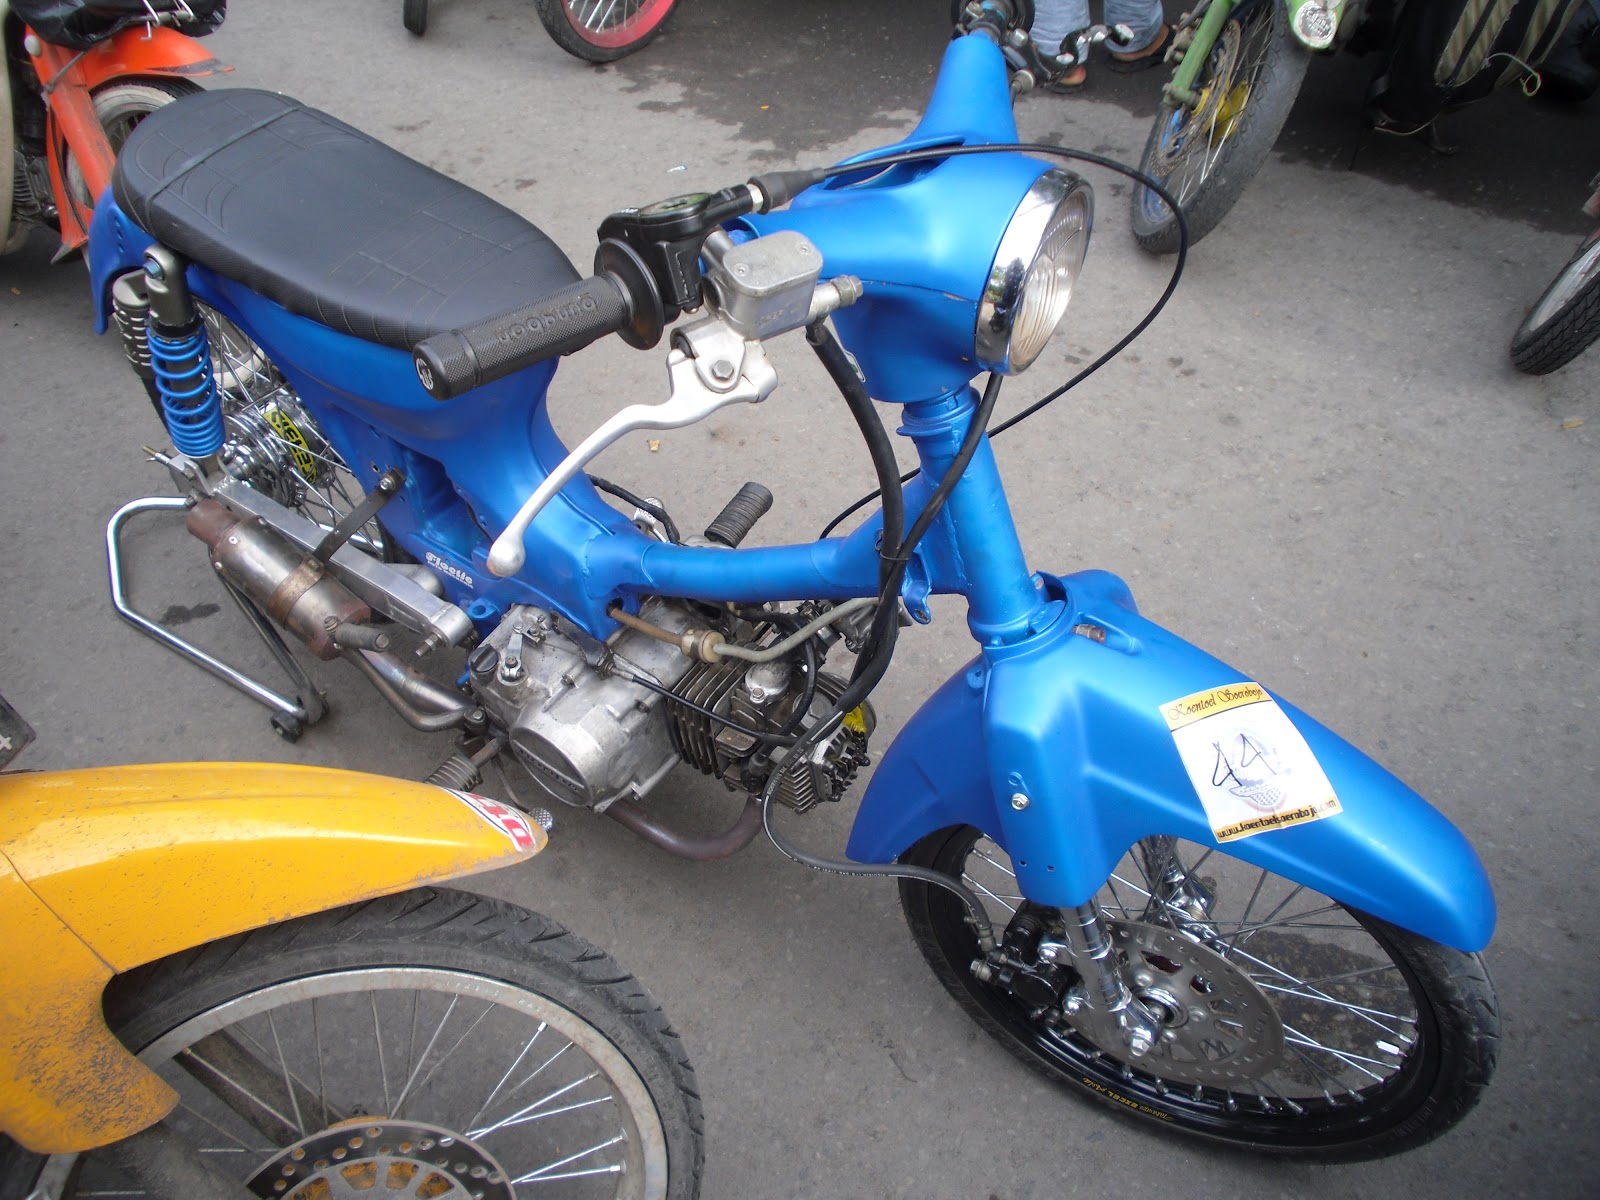 Kejuaraan Dragbike Honda C70 Brotherhood CUB Owner Jember BCOJ